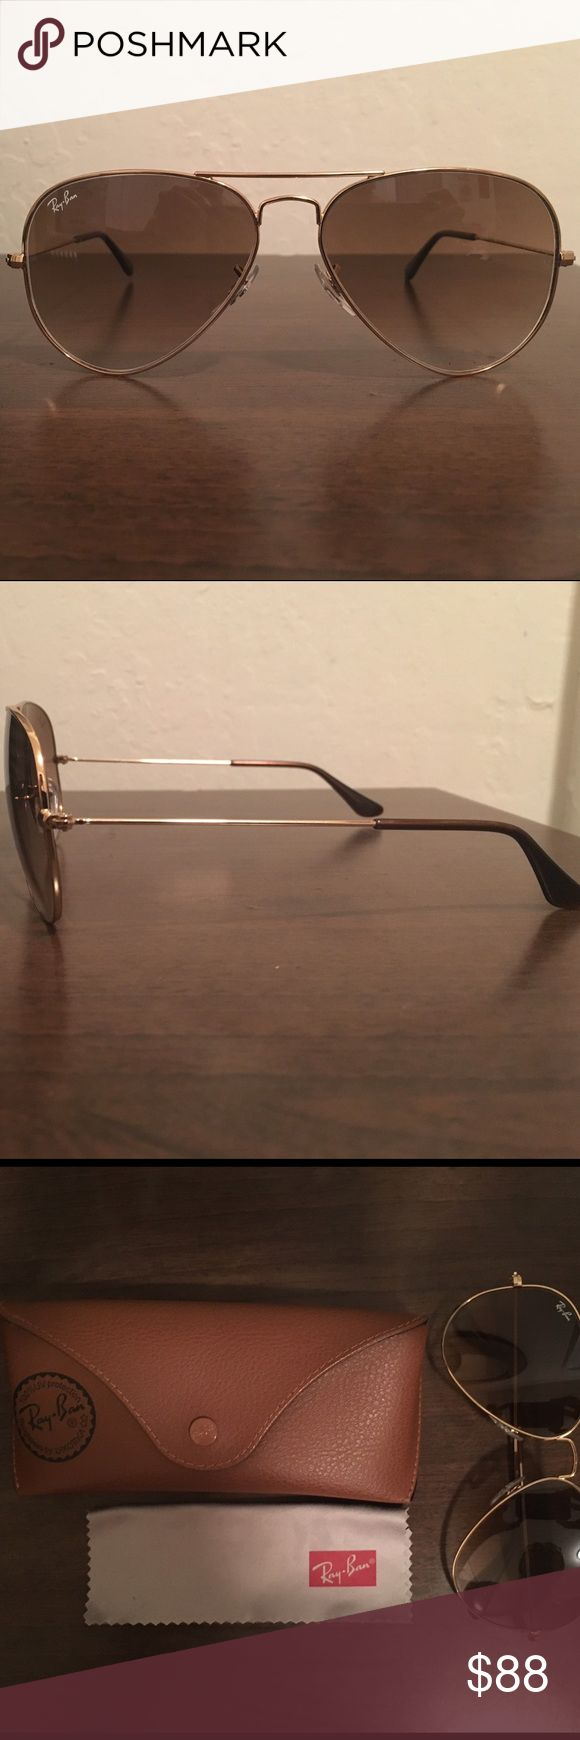 Ray Ban Sunglasses Gold Aviators, worn a few times, like new. Ray-Ban Accessories Glasses